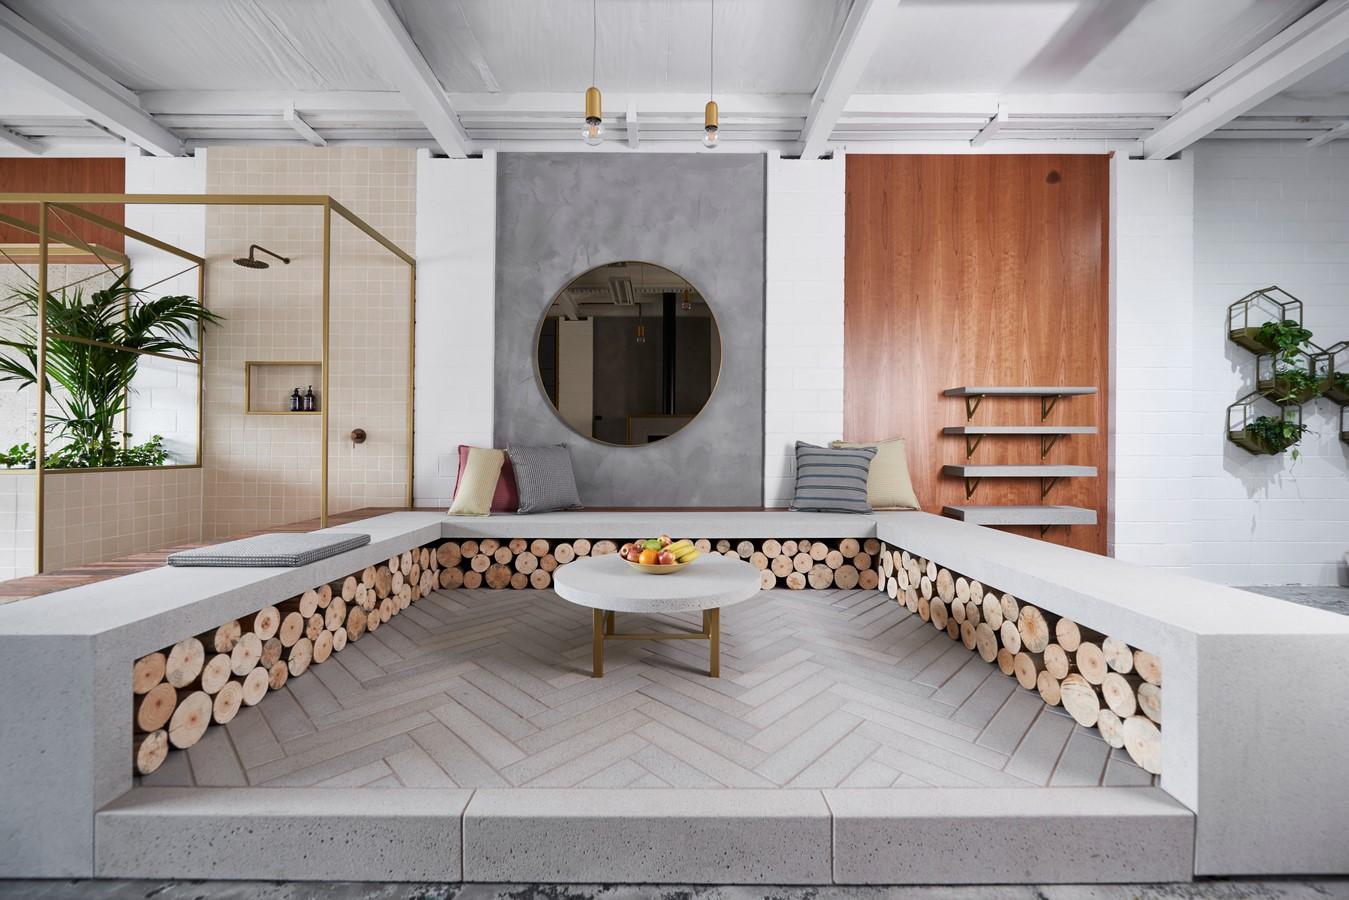 Anston Architectural by Dan Gayfer Design - Sheet3